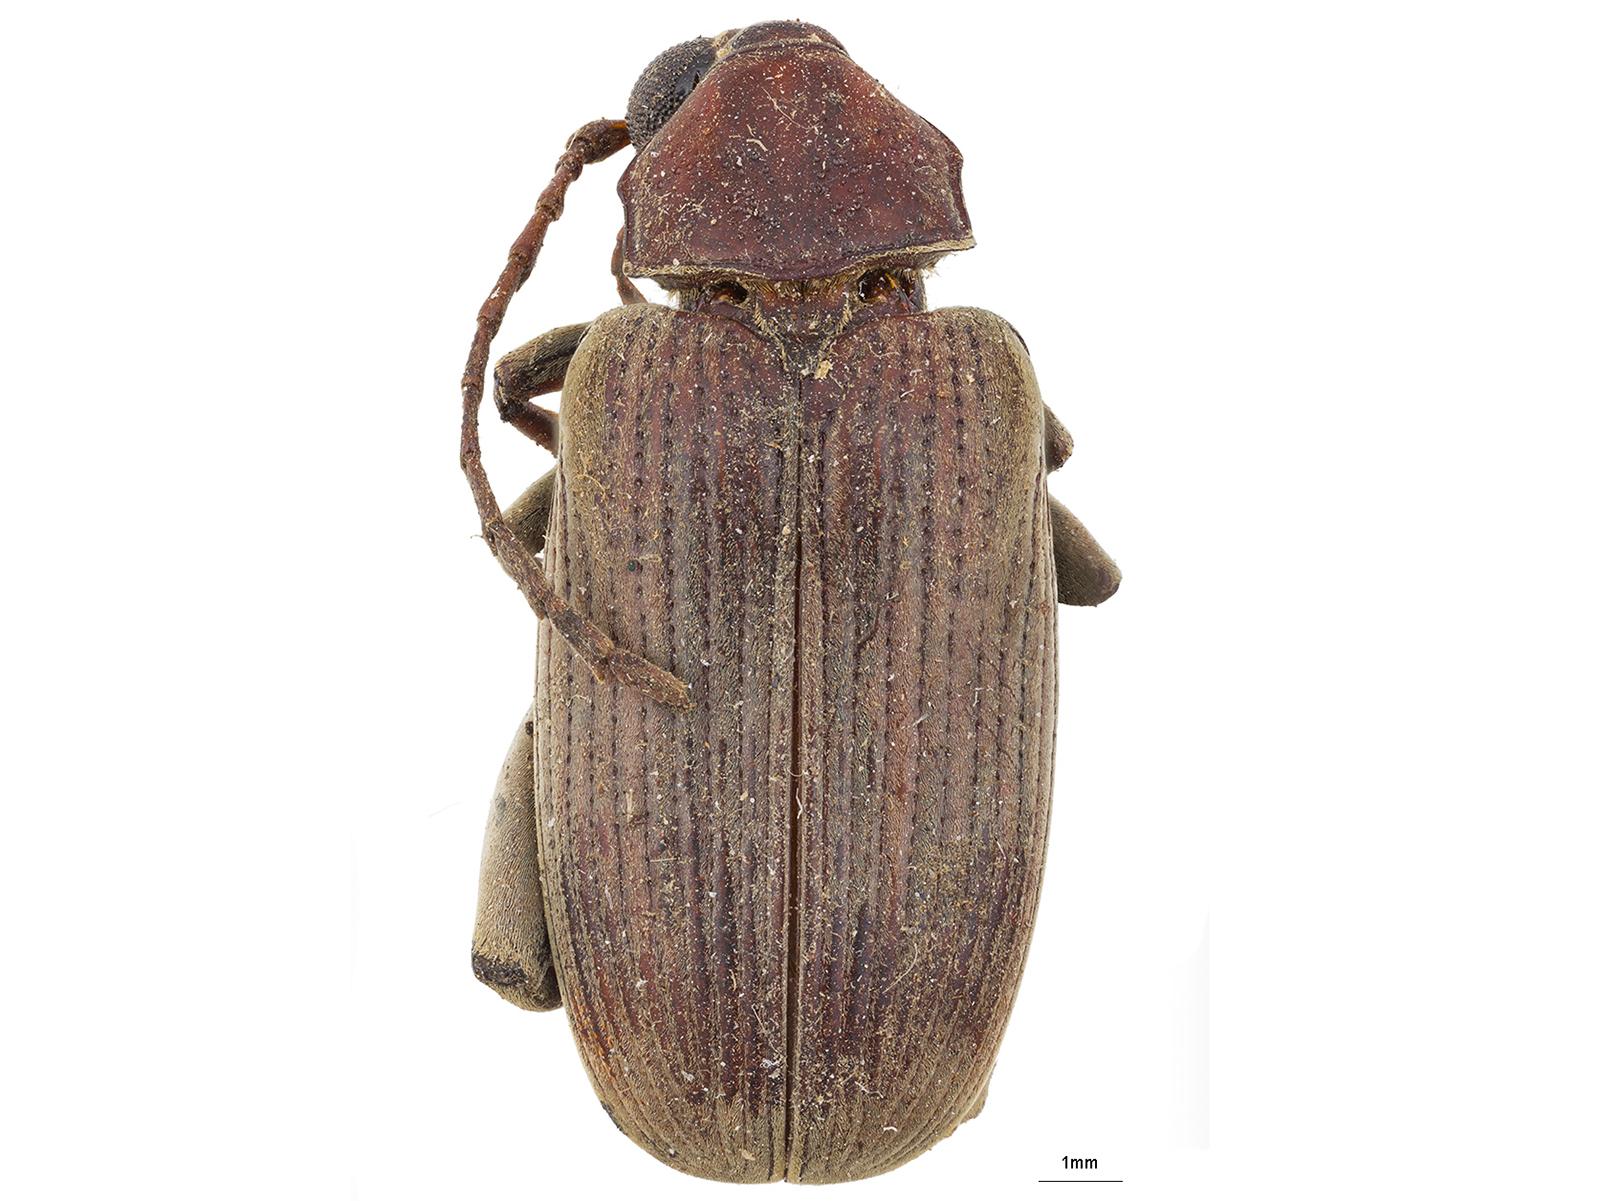 Caryobruchus sp.